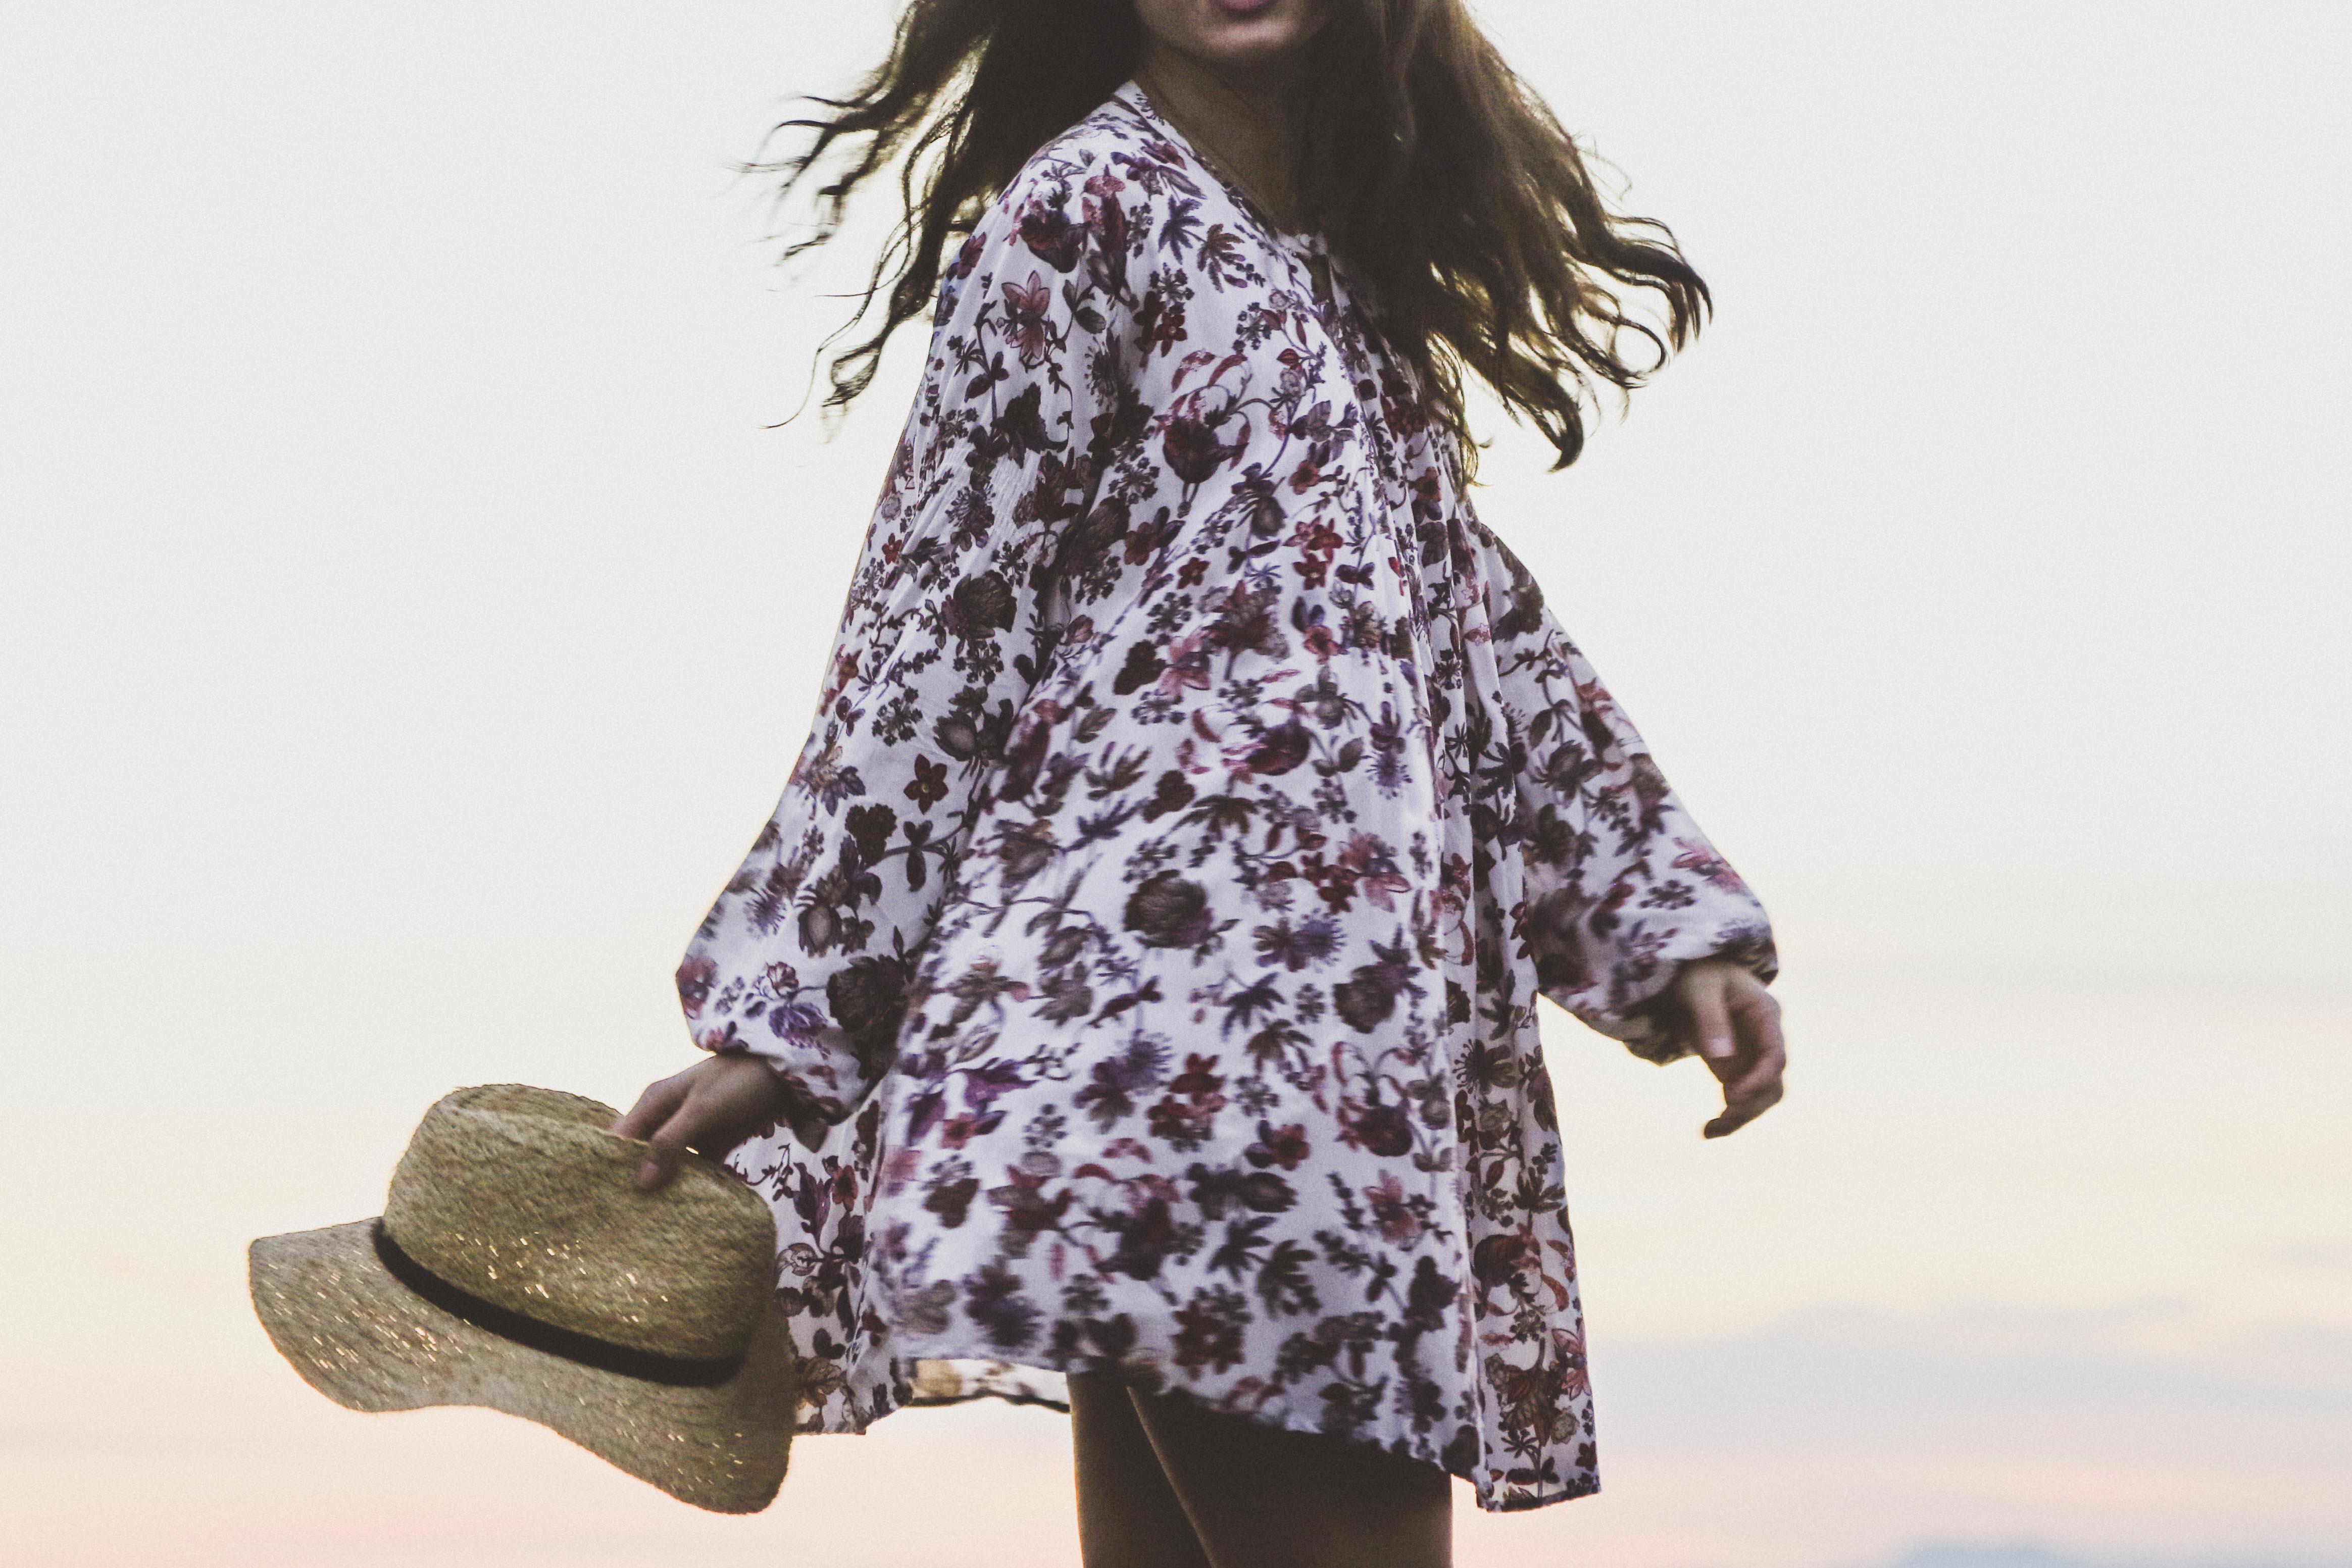 10 best looks from Coachella 2017